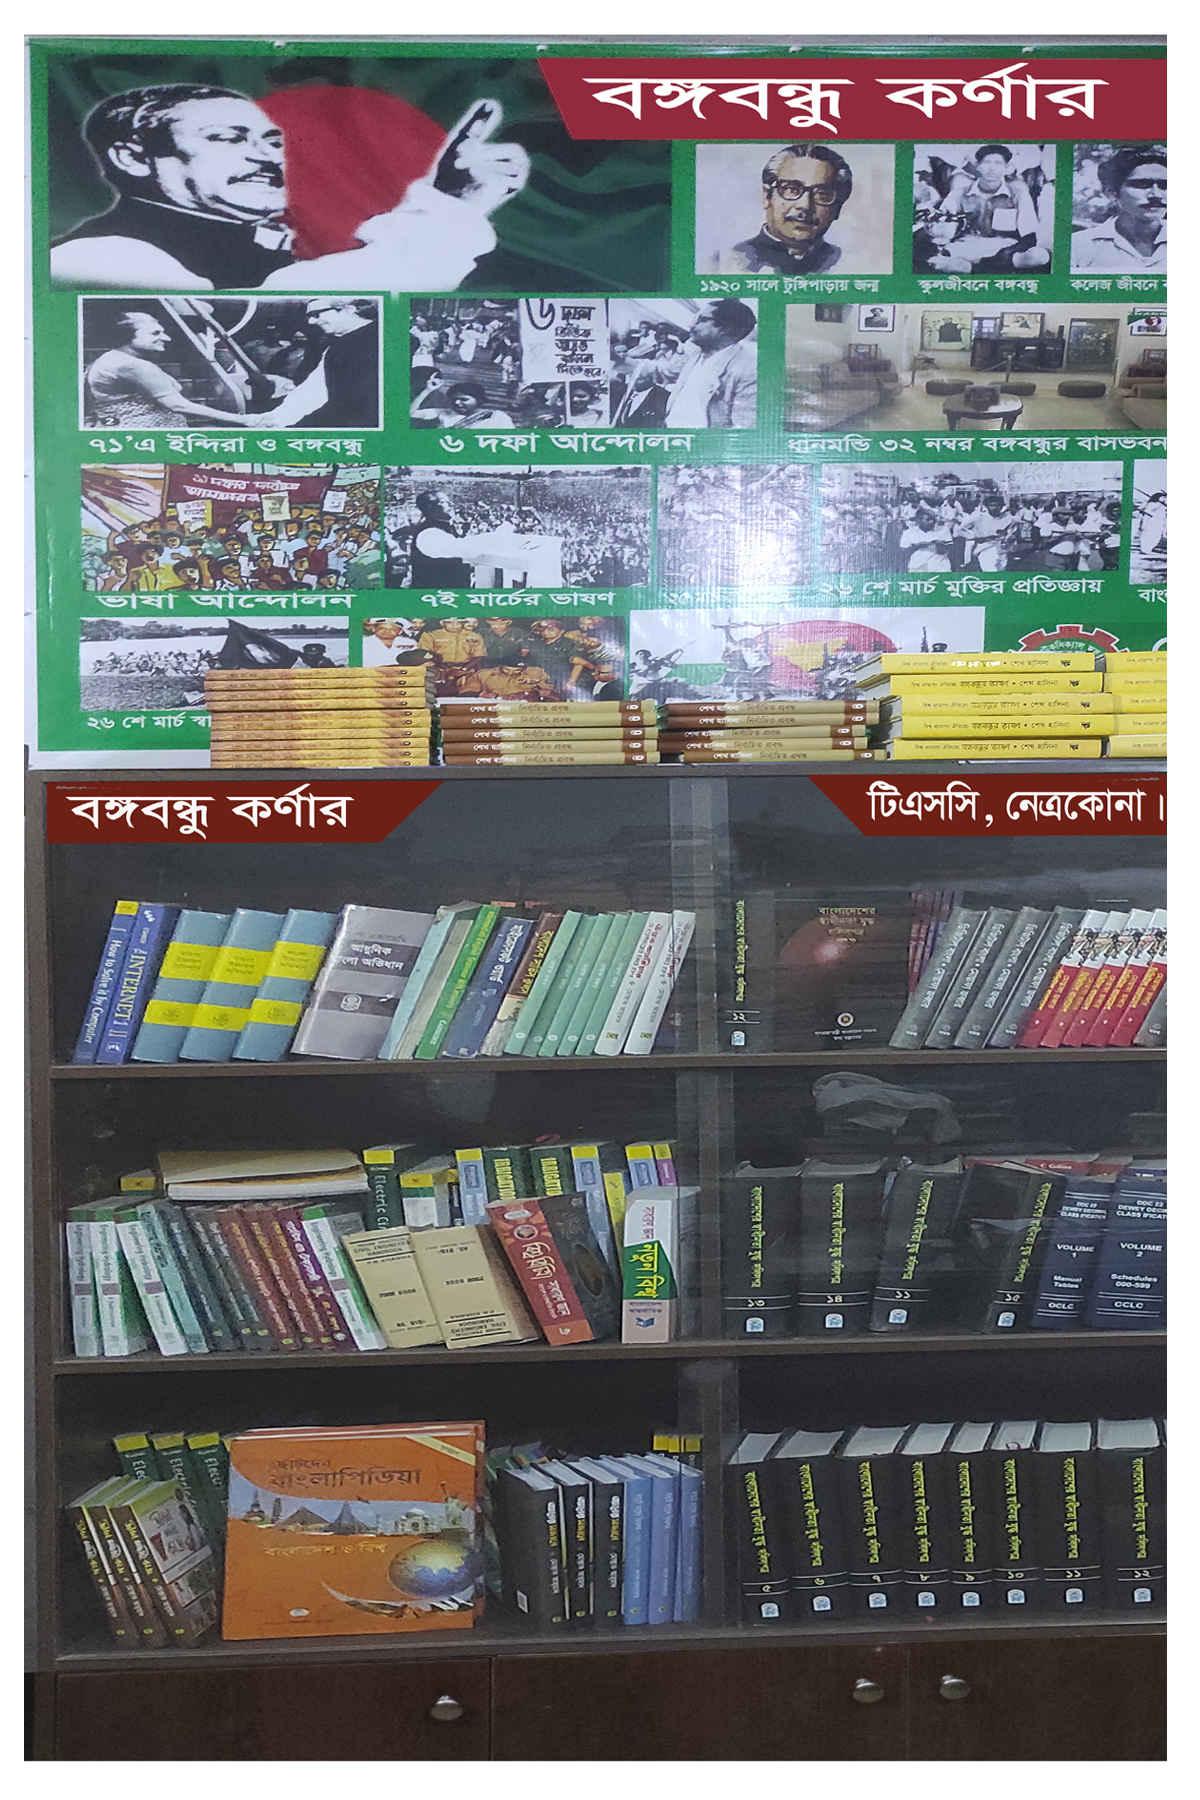 Shelf of Bongobondhu Korner